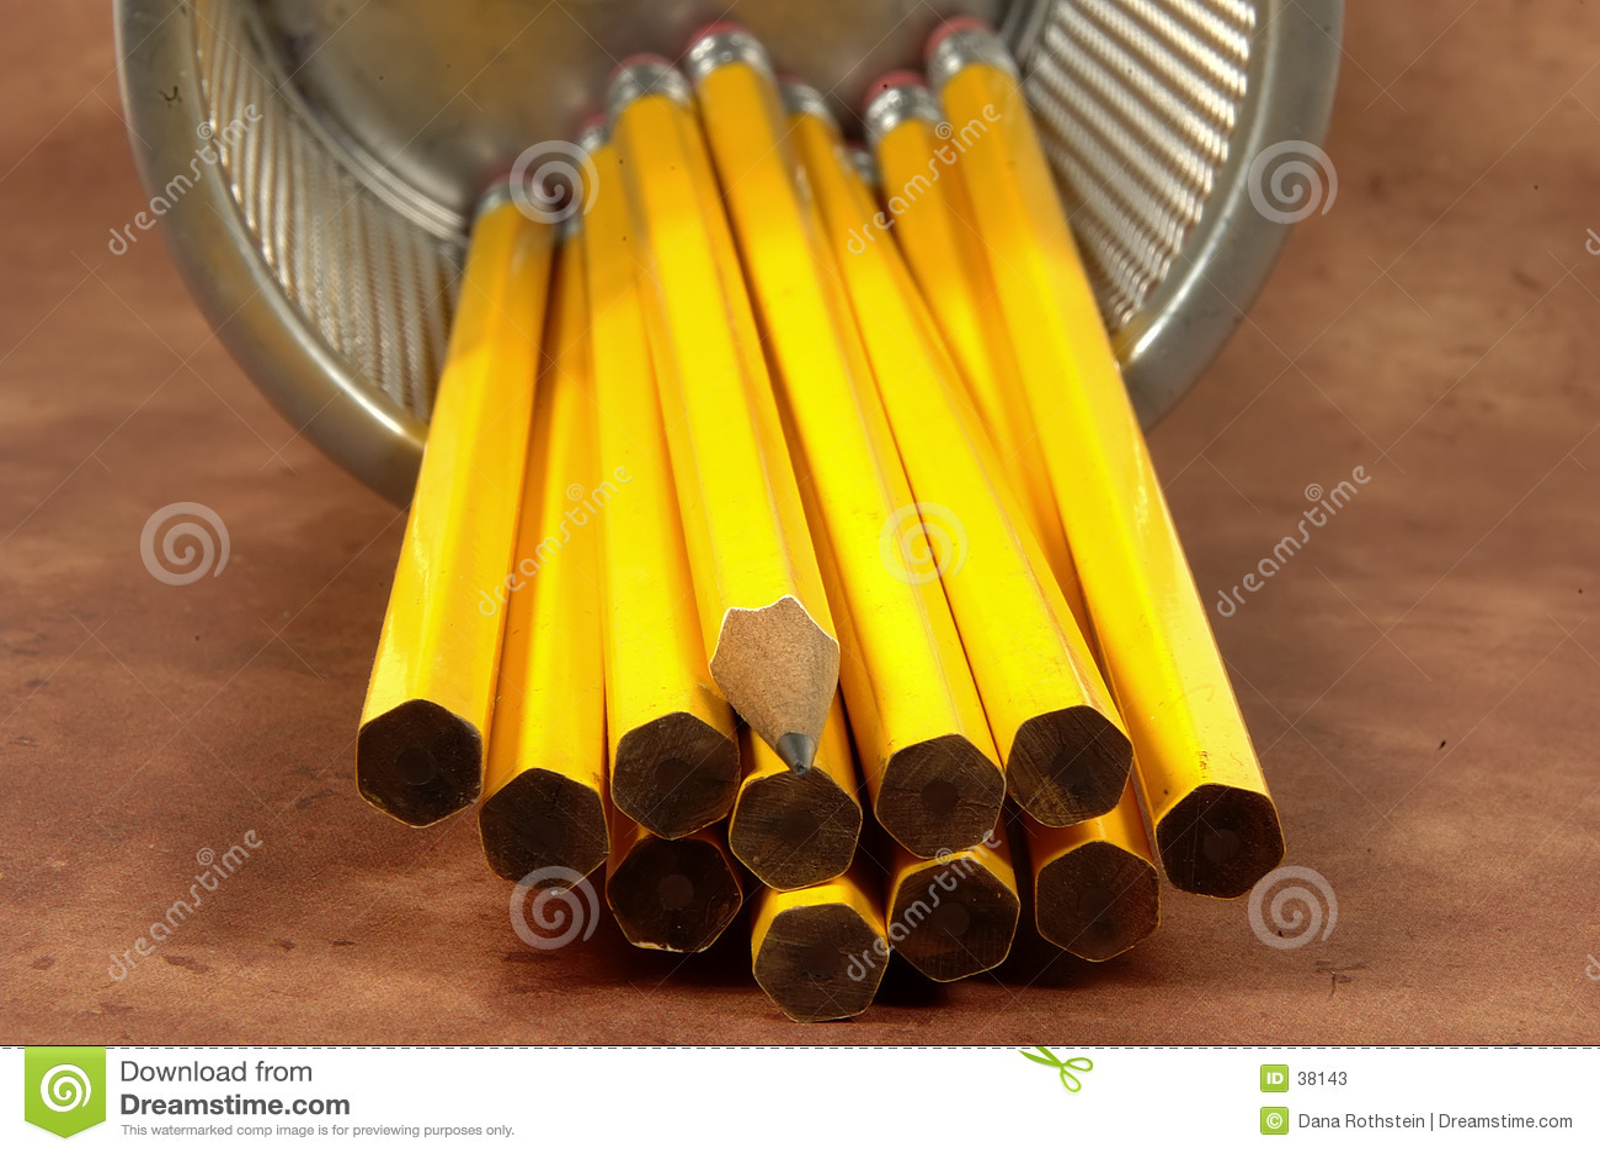 Unsharpened 3支的铅笔